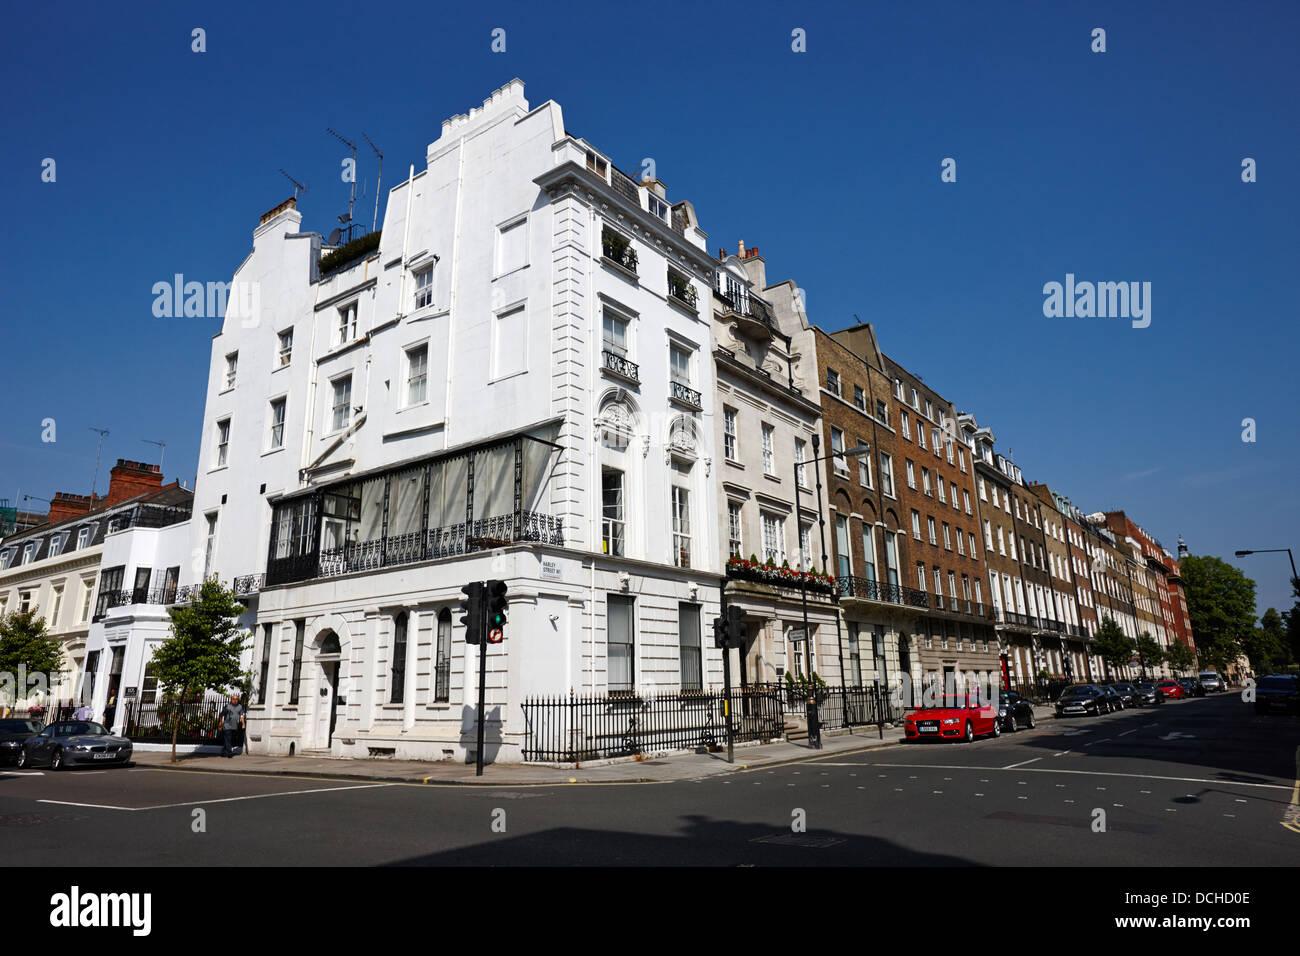 Gesamtansicht der Harley Street London England UK Stockbild